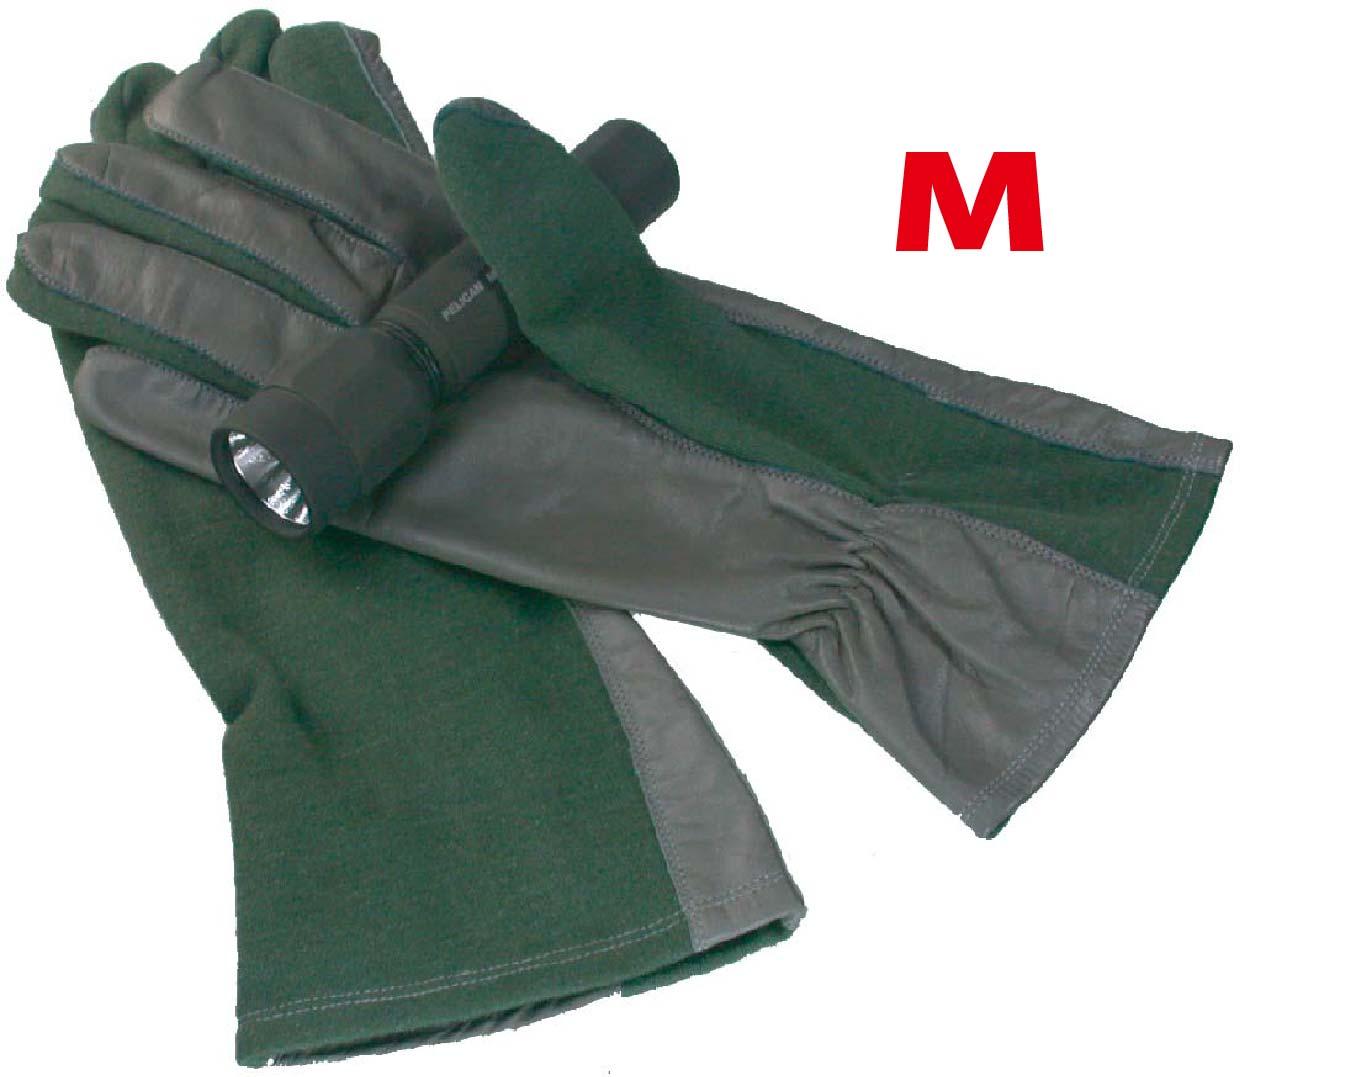 MIL-FORCE ミルフォース ノーメックス/本革 パイロットグラブ  手袋 オリーブ Mサイズ PG-05P-OD-M